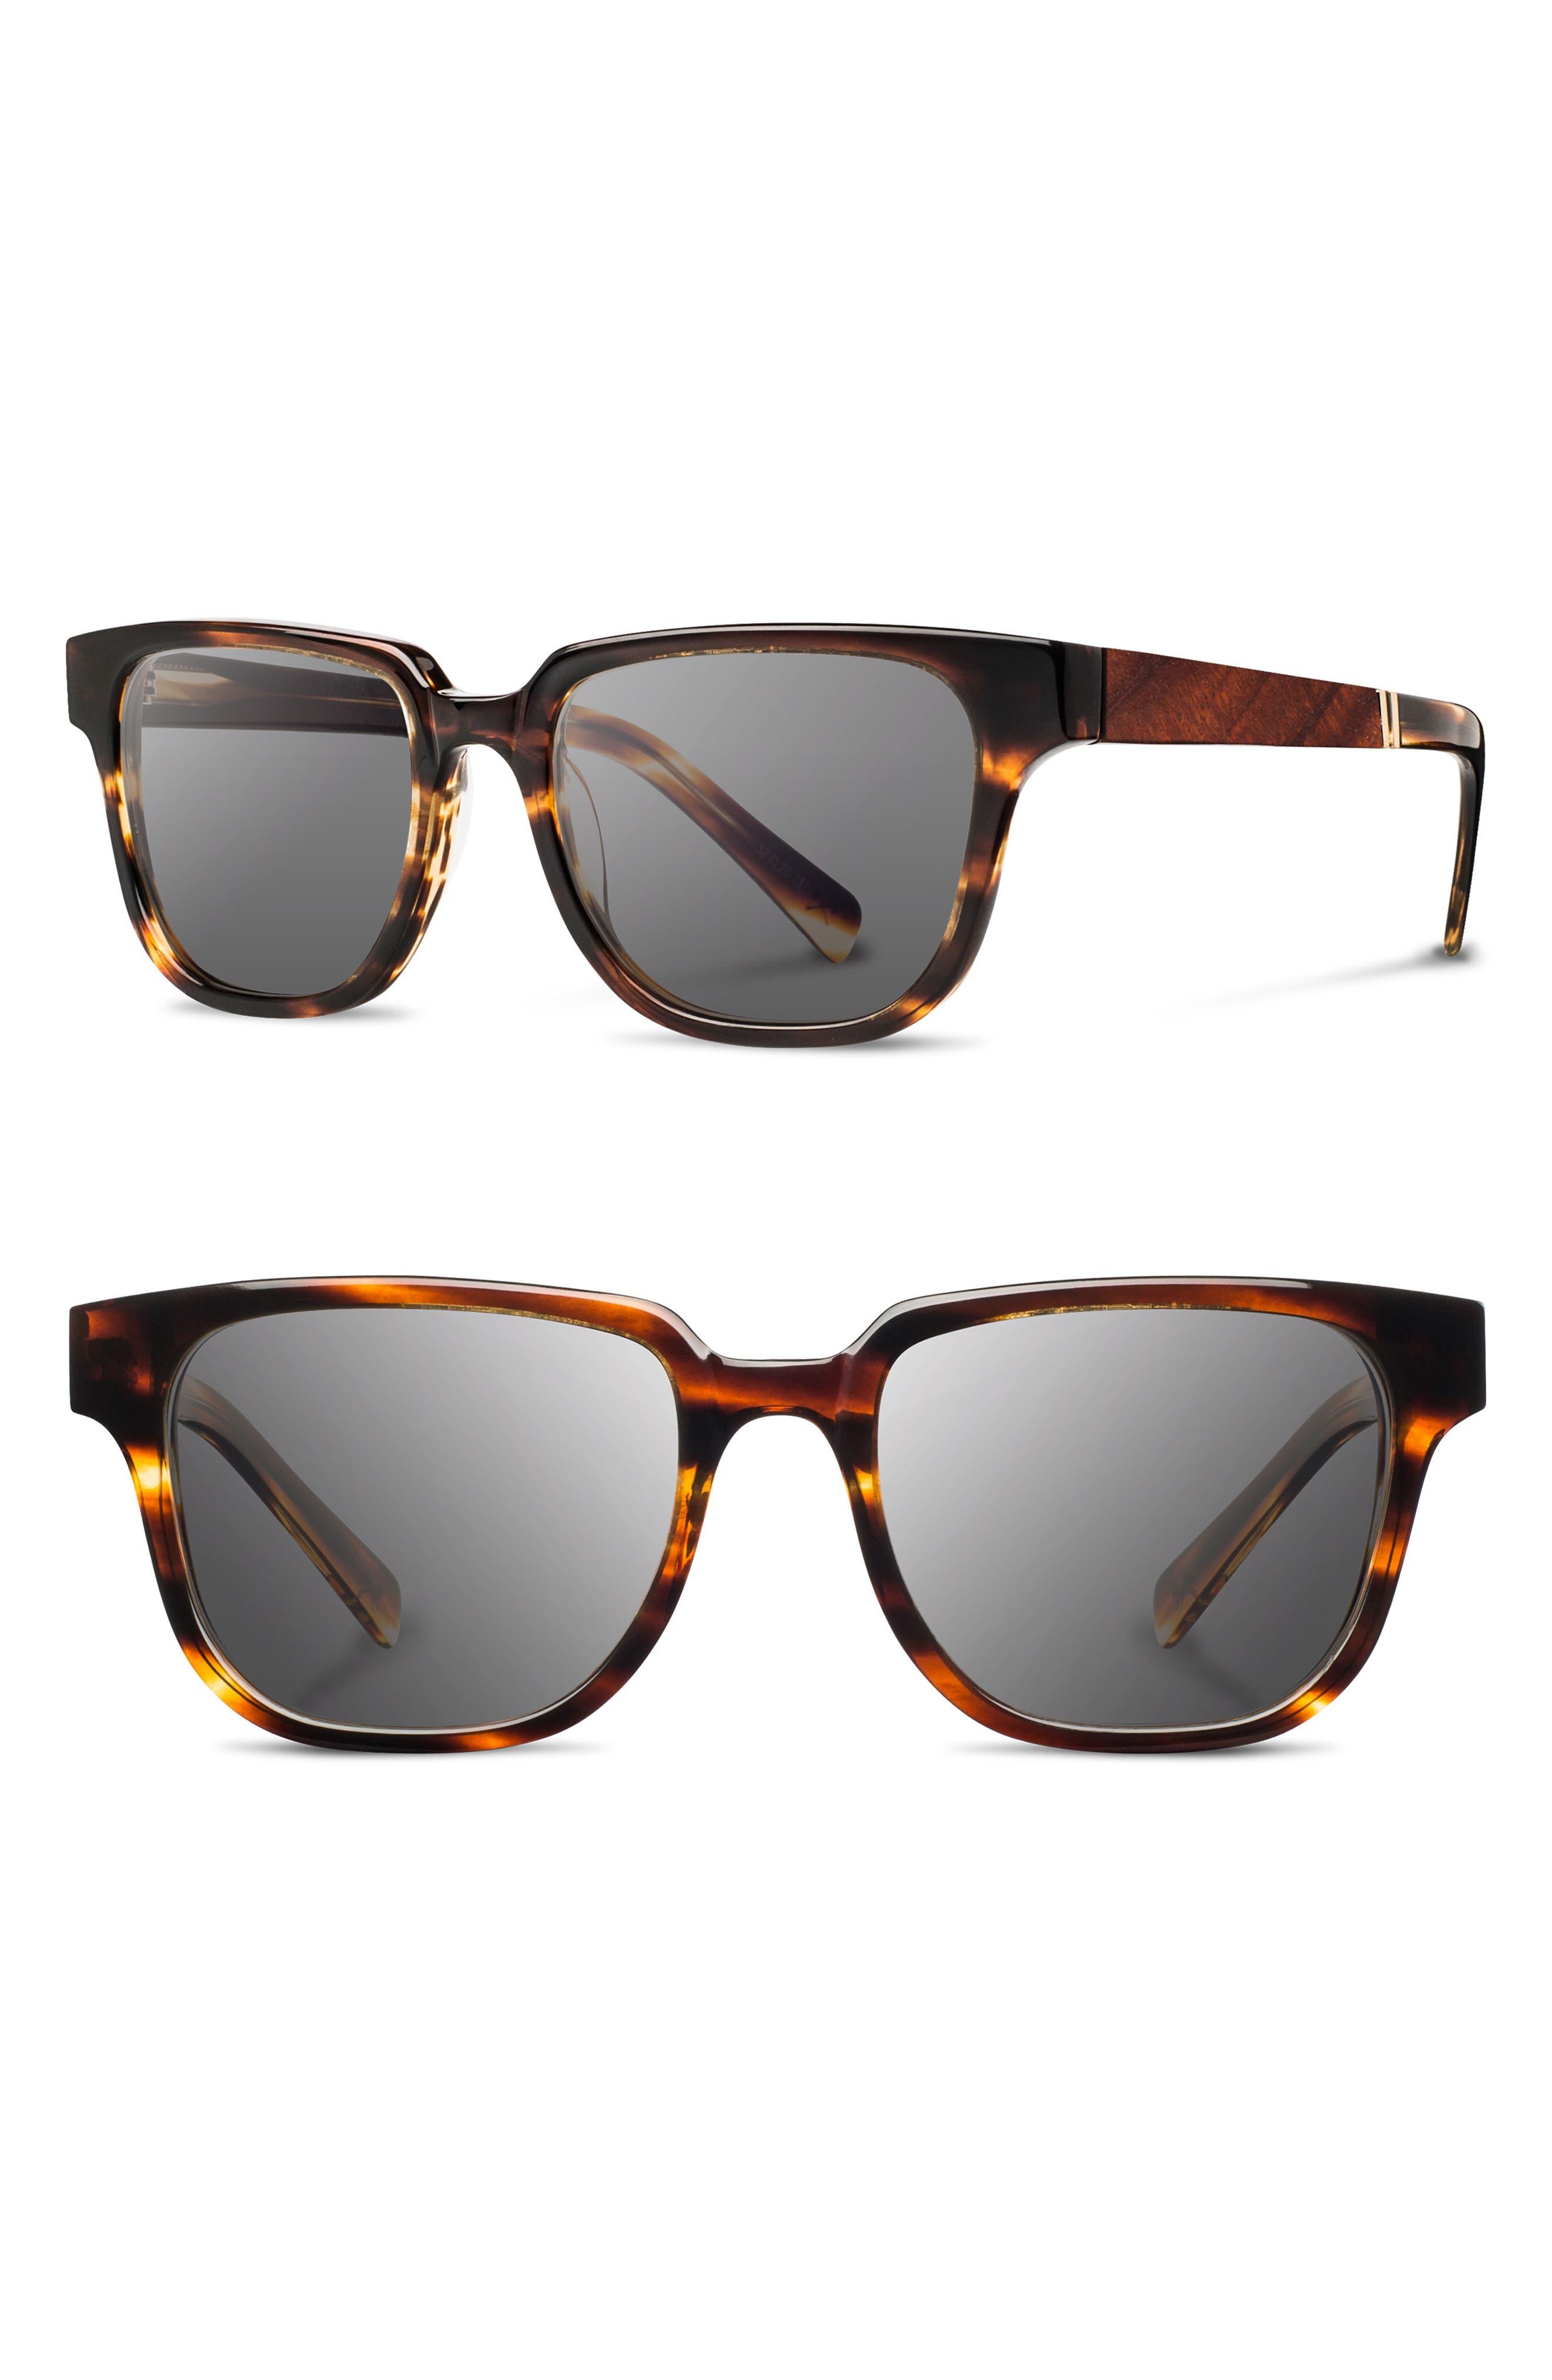 'Prescott' 52mm Polarized Sunglasses,                             Main thumbnail 1, color,                             Tortoise/ Mahogany/ Grey